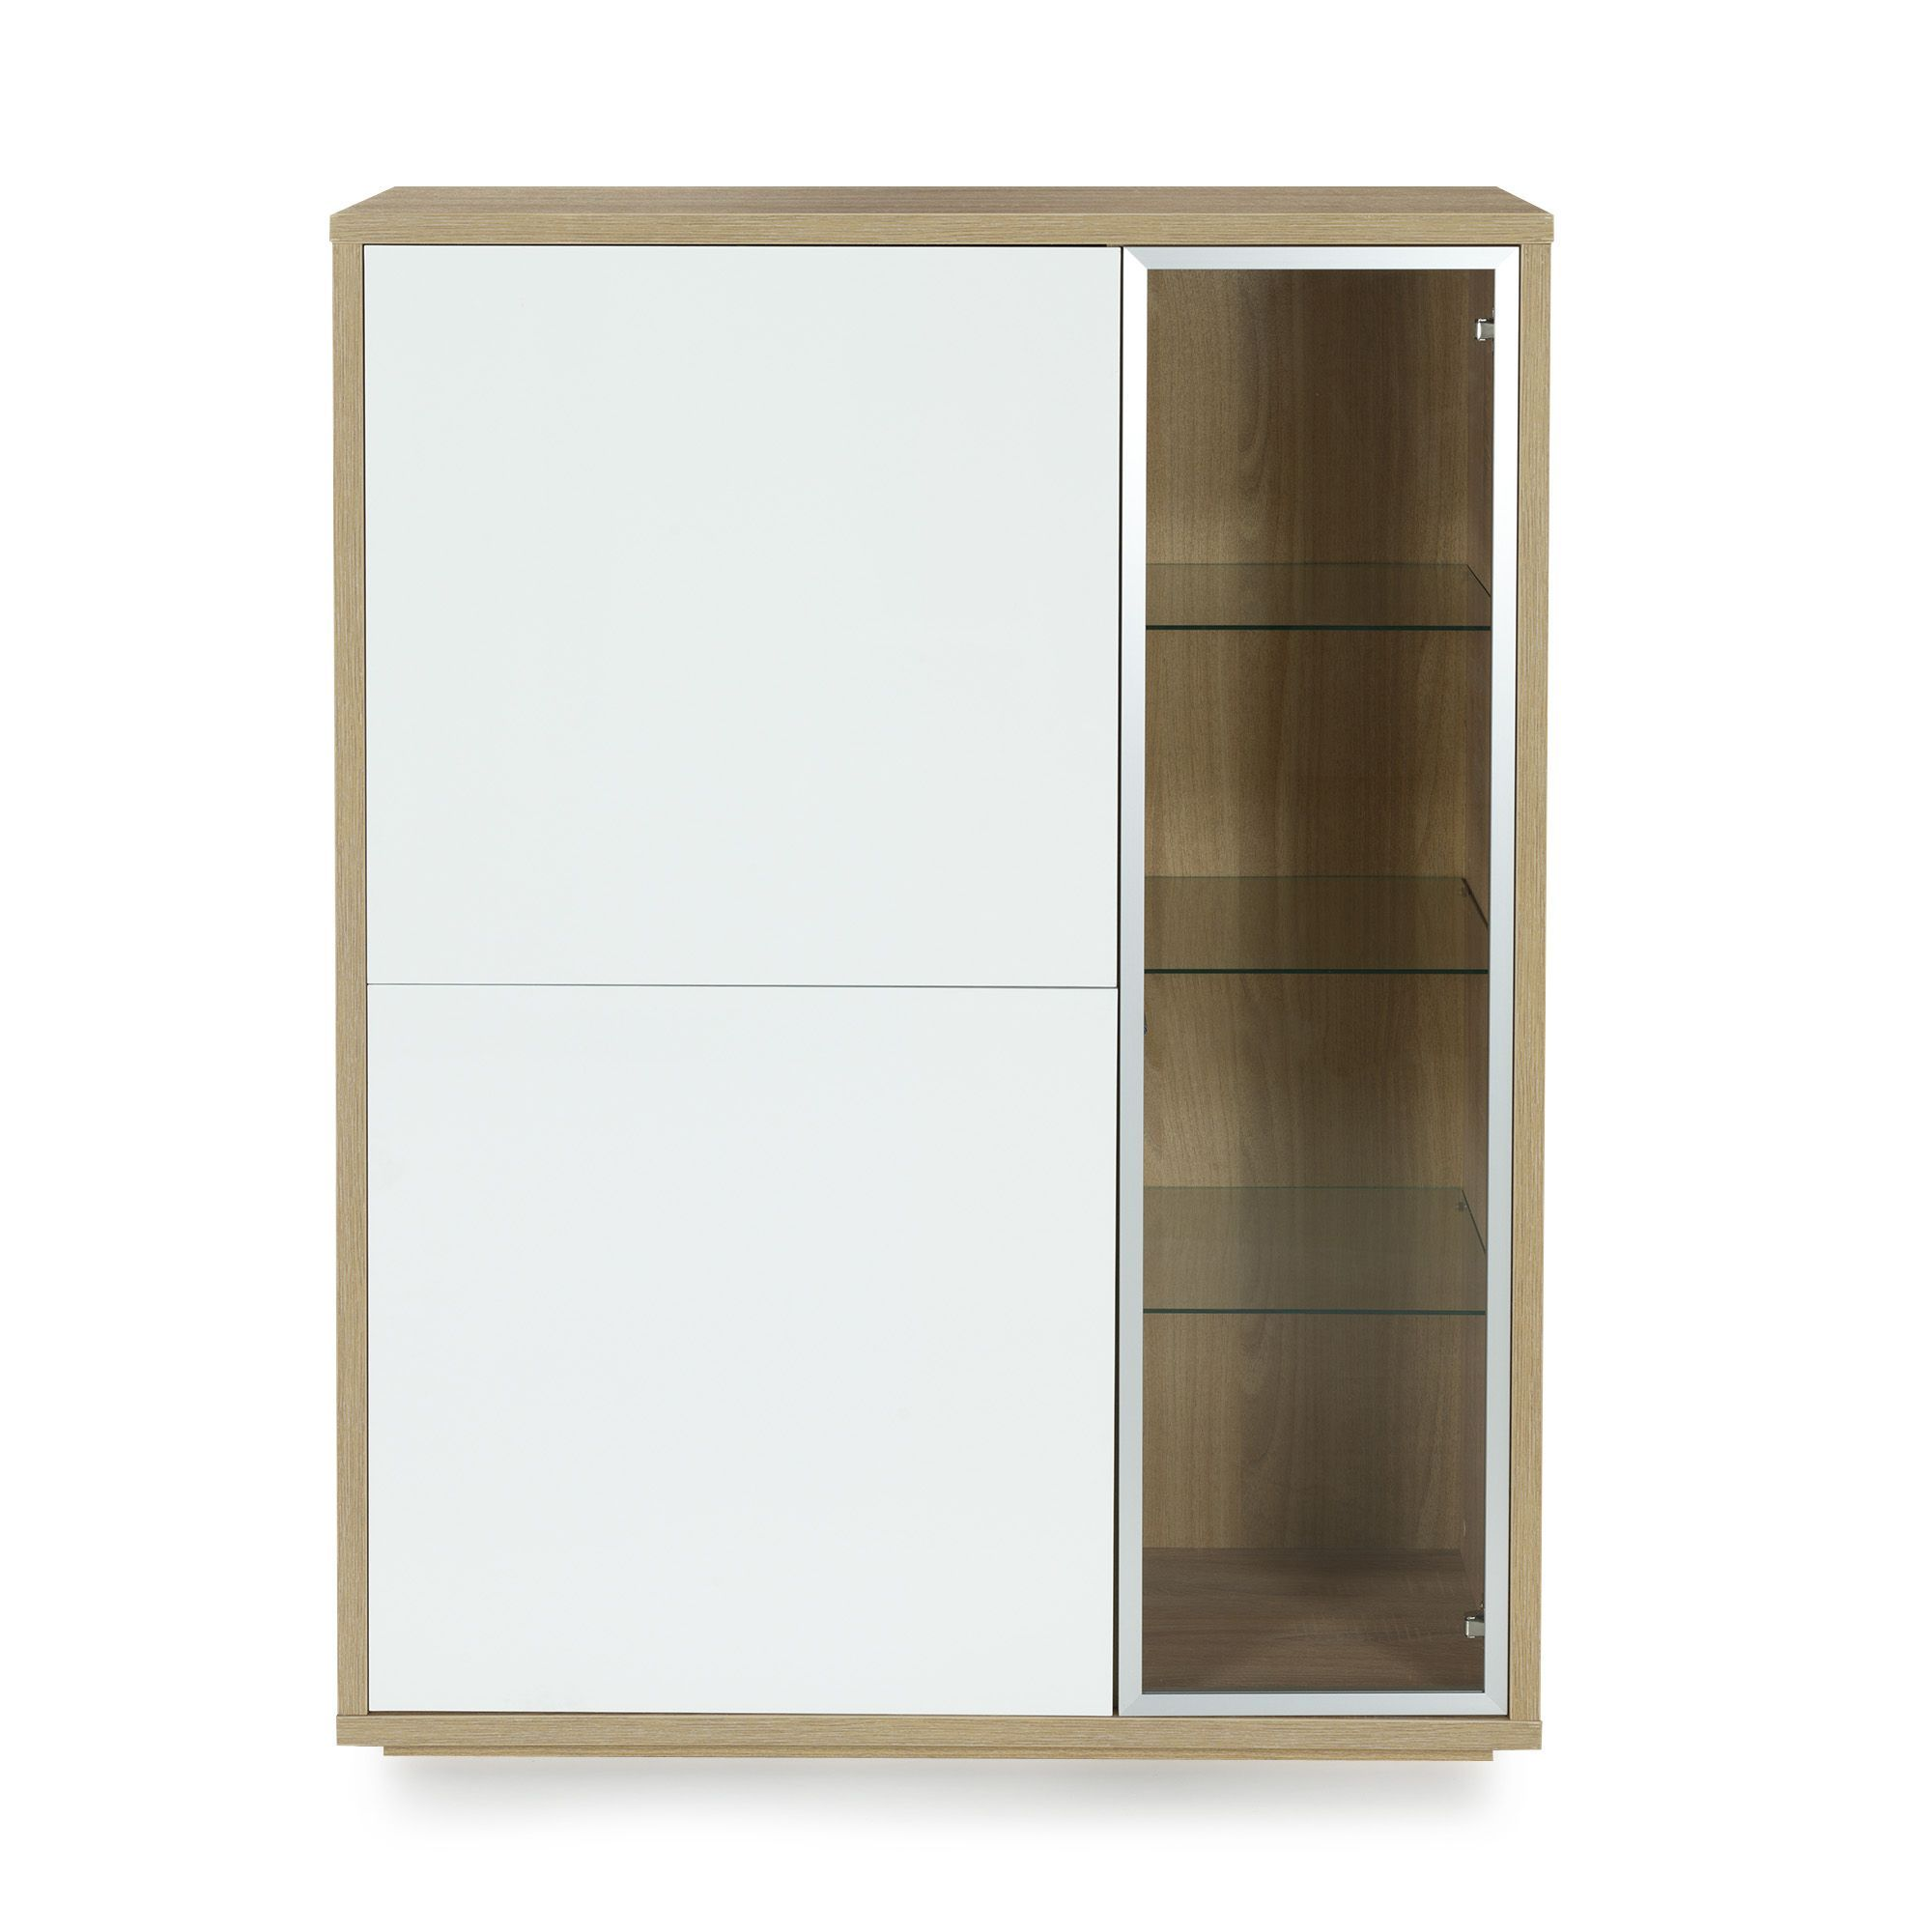 Meuble Vitrine 3 Portes Design Scandinave Imitation Ch Ne Blanc  # Meuble Tele Chene Et Blanc Design